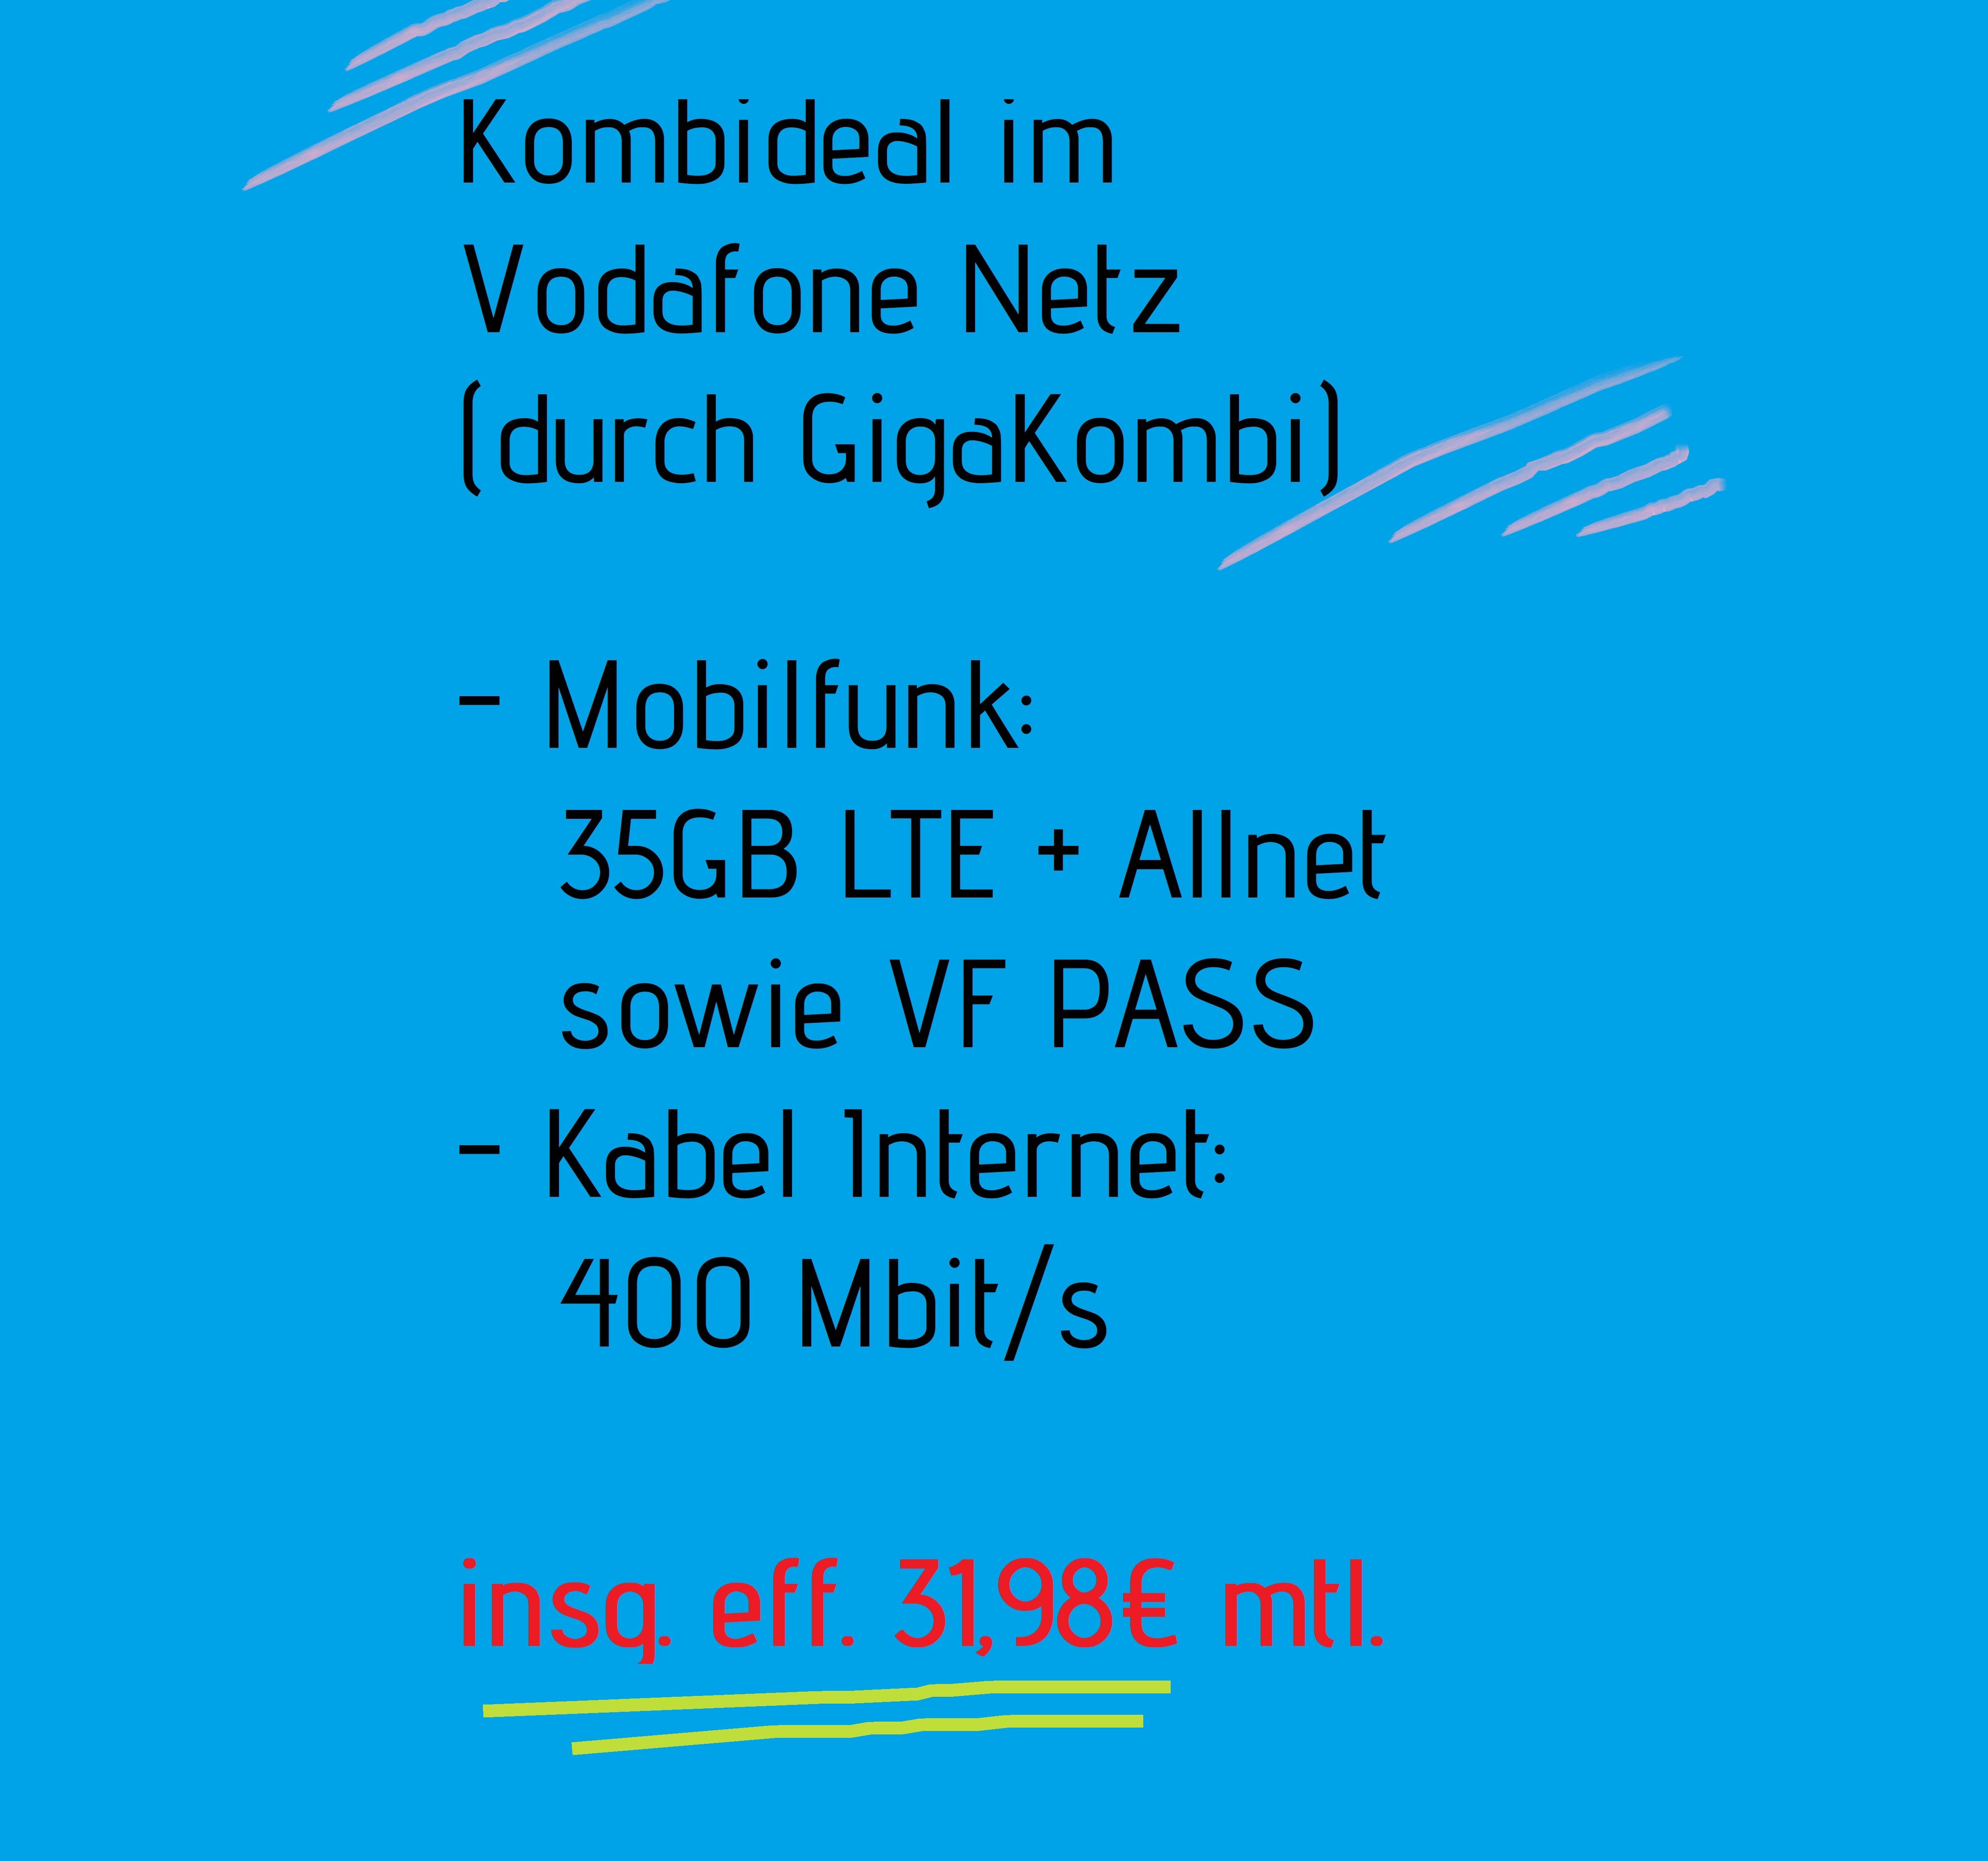 [VF Young] 25GB LTE + ALLNET eff. 26,99 mtl.   mit GK 35GB eff. 16,99€ sowie Kabel 400 eff. 14,99 mtl.